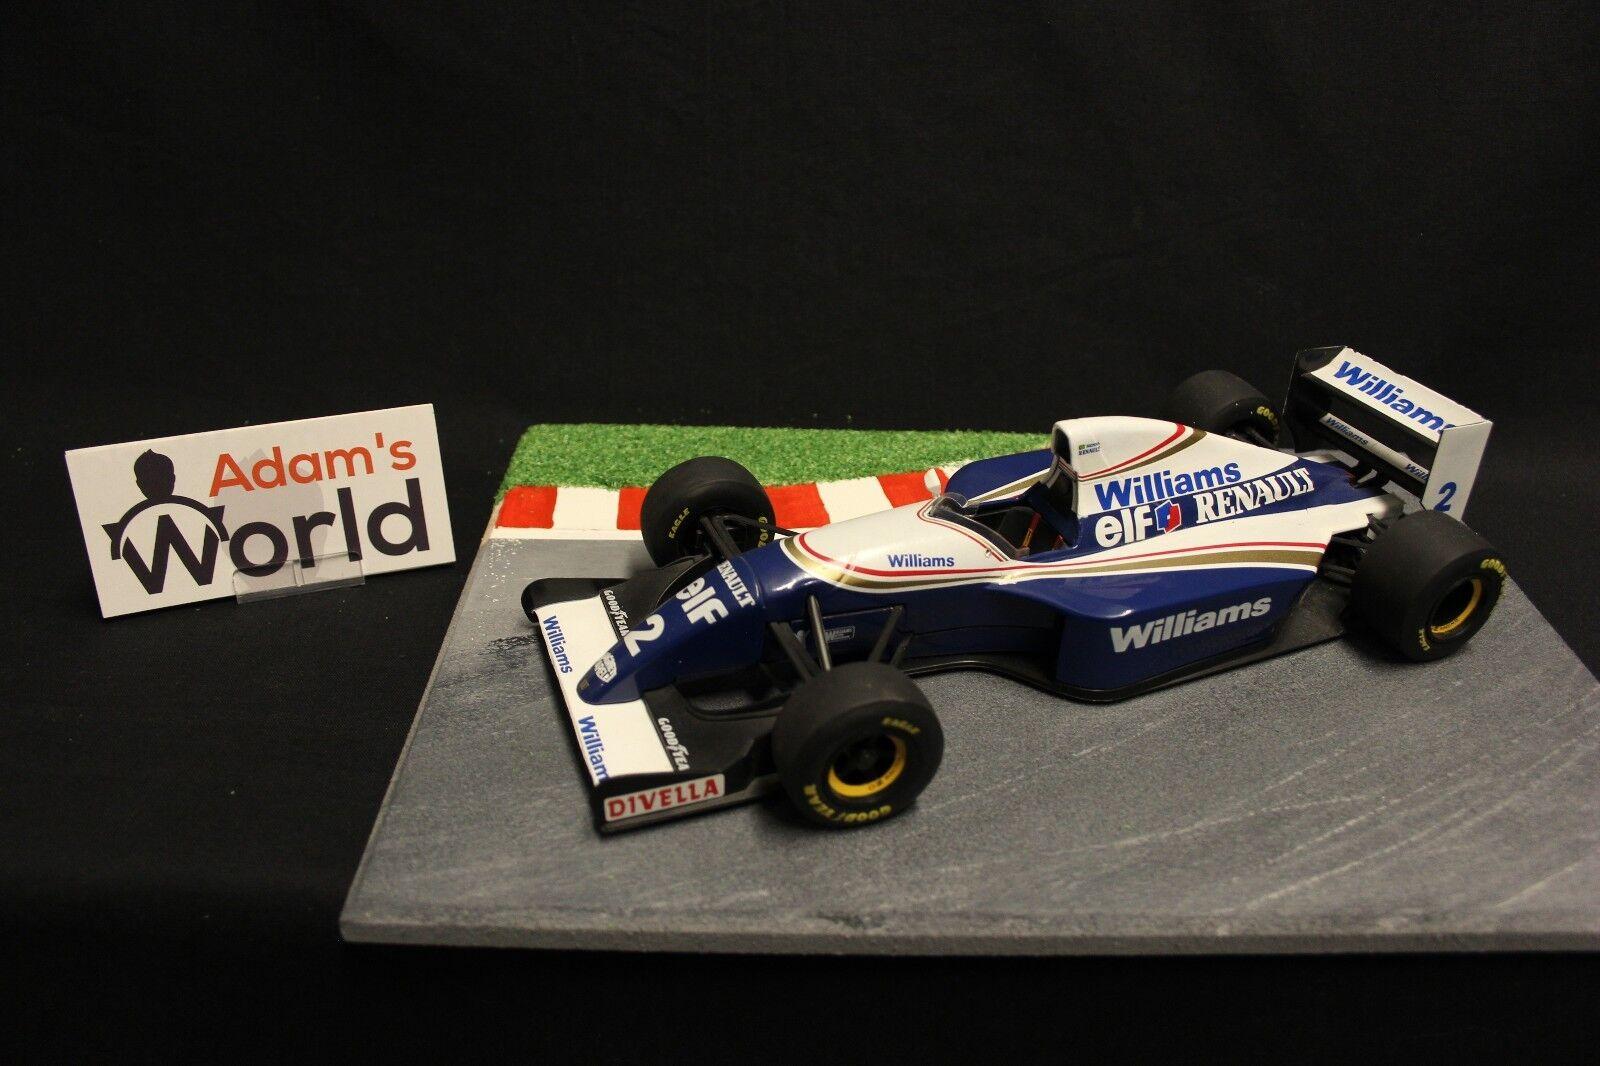 Minichamps Williams Renault show car 1994 1:18  2 Ayrton Senna  BRA   F1NB